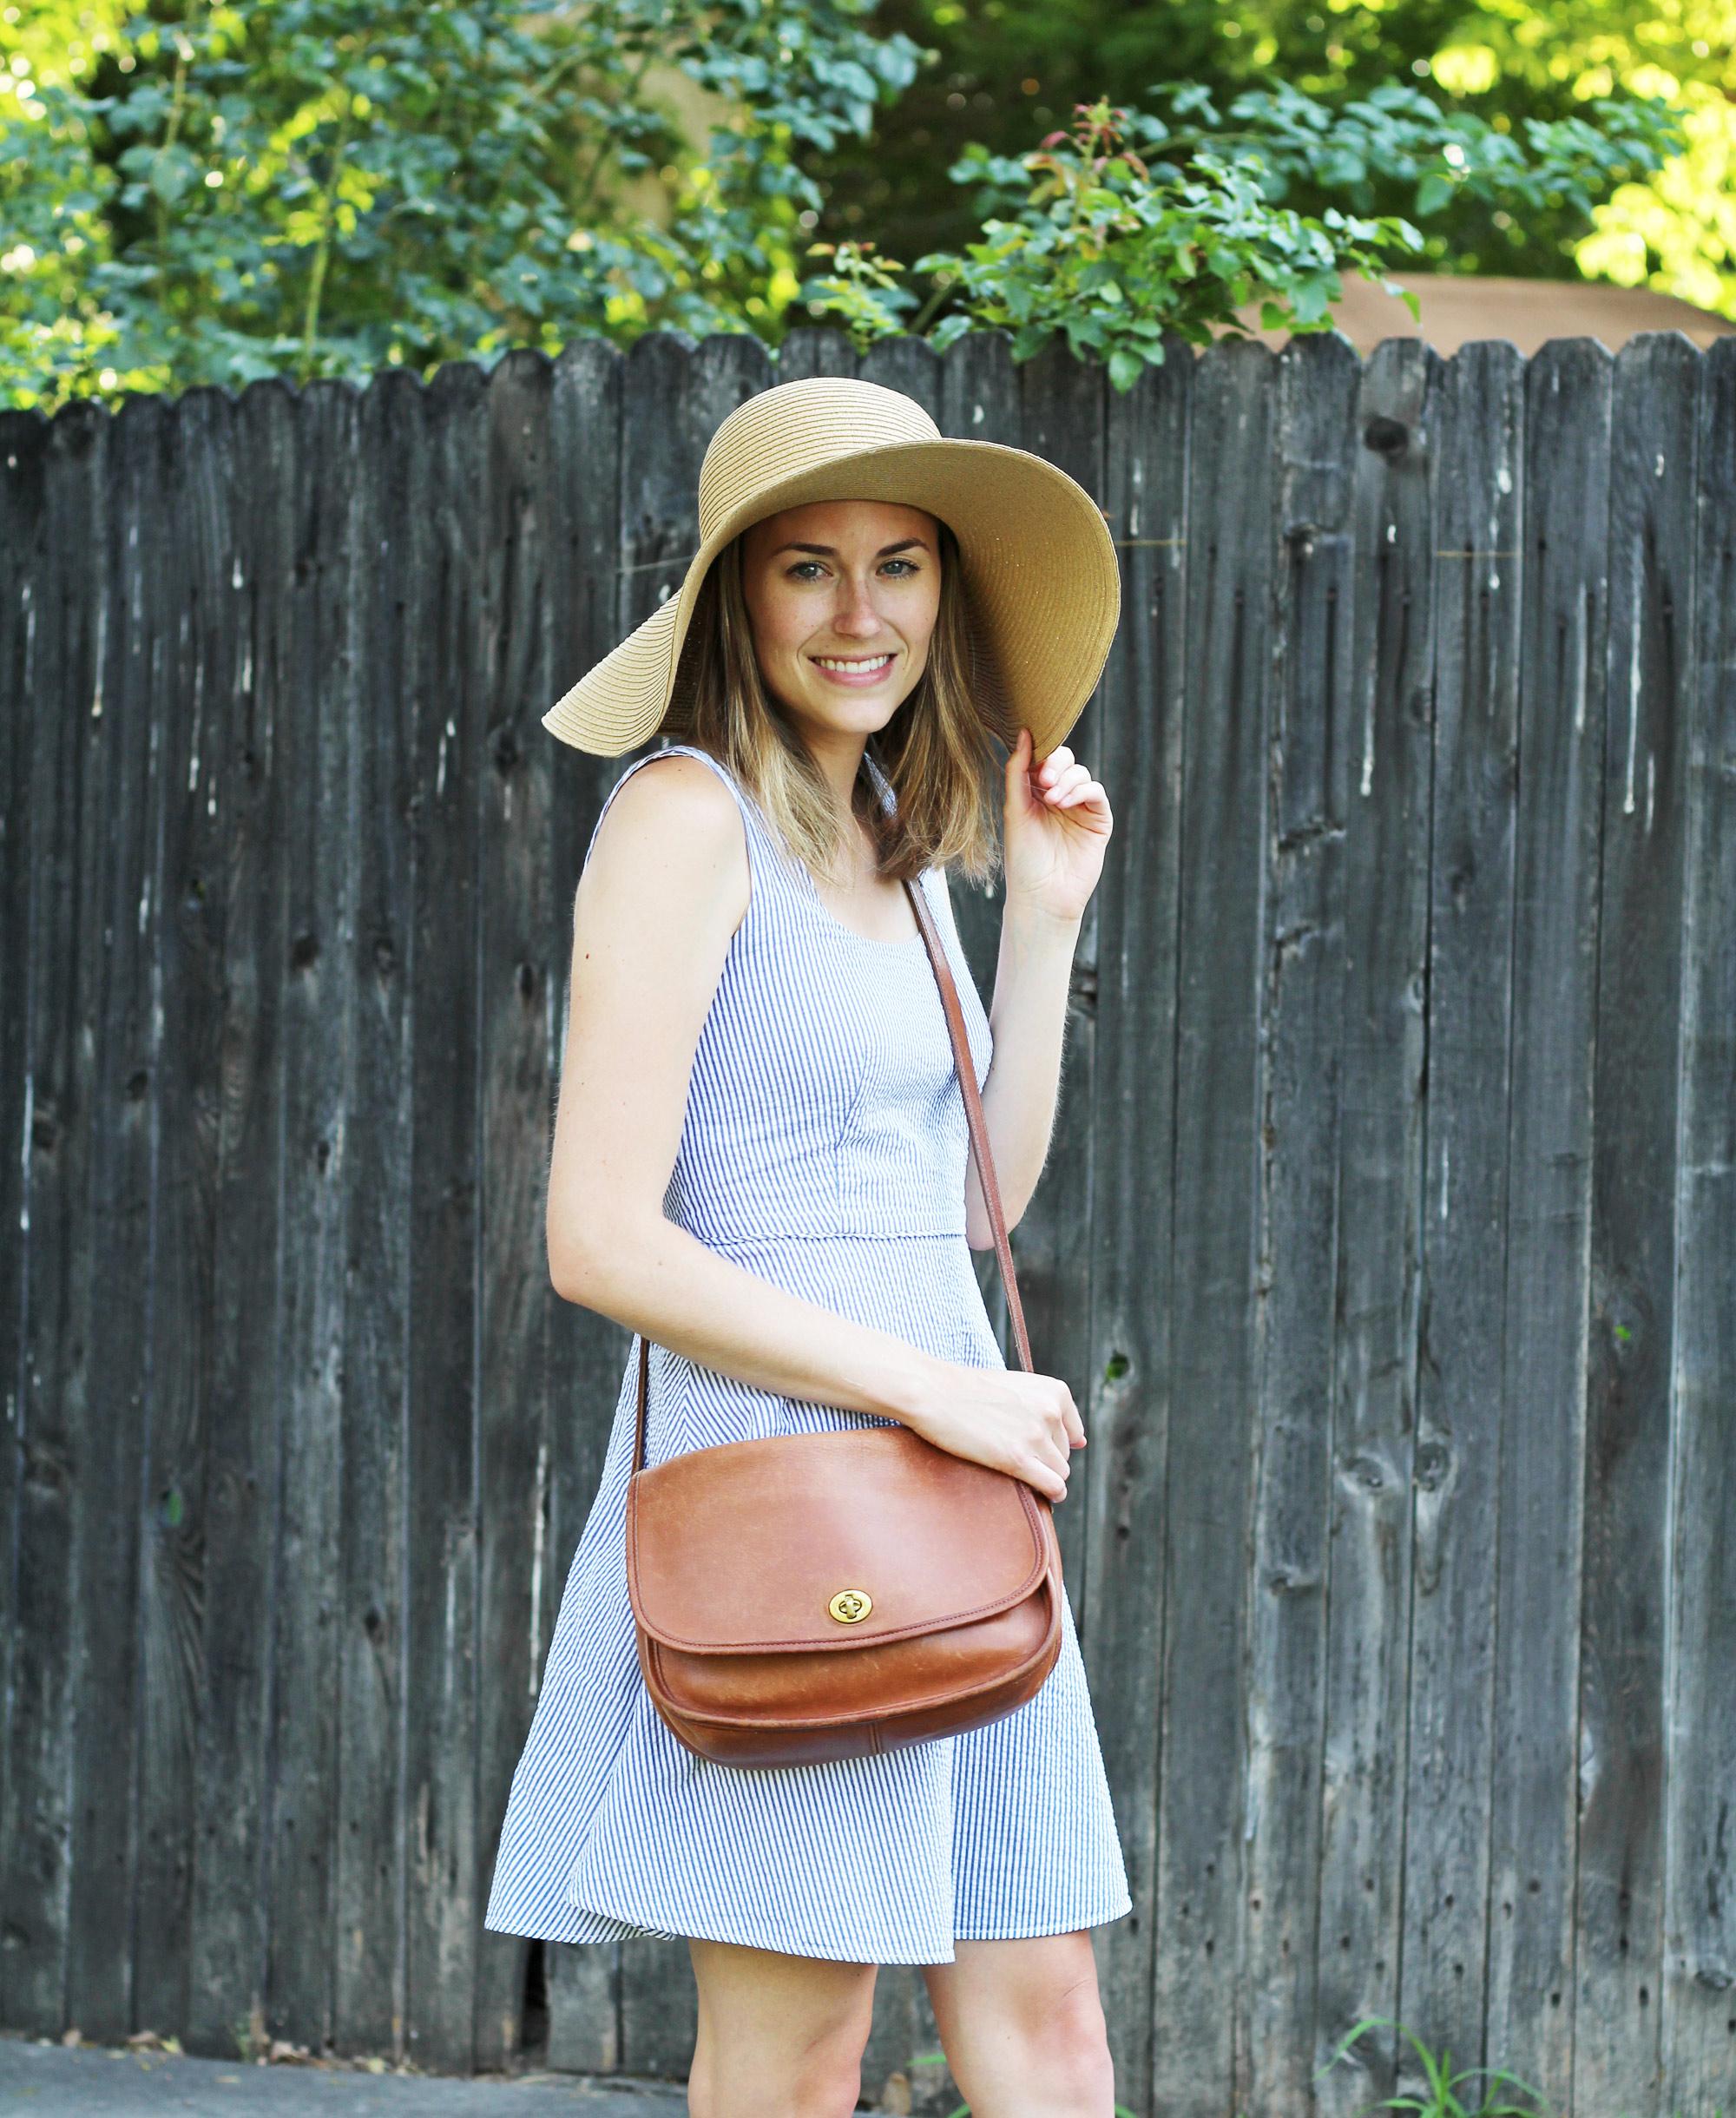 Seersucker dress outfit with floppy sun hat and cognac Coach bag — Cotton Cashmere Cat Hair